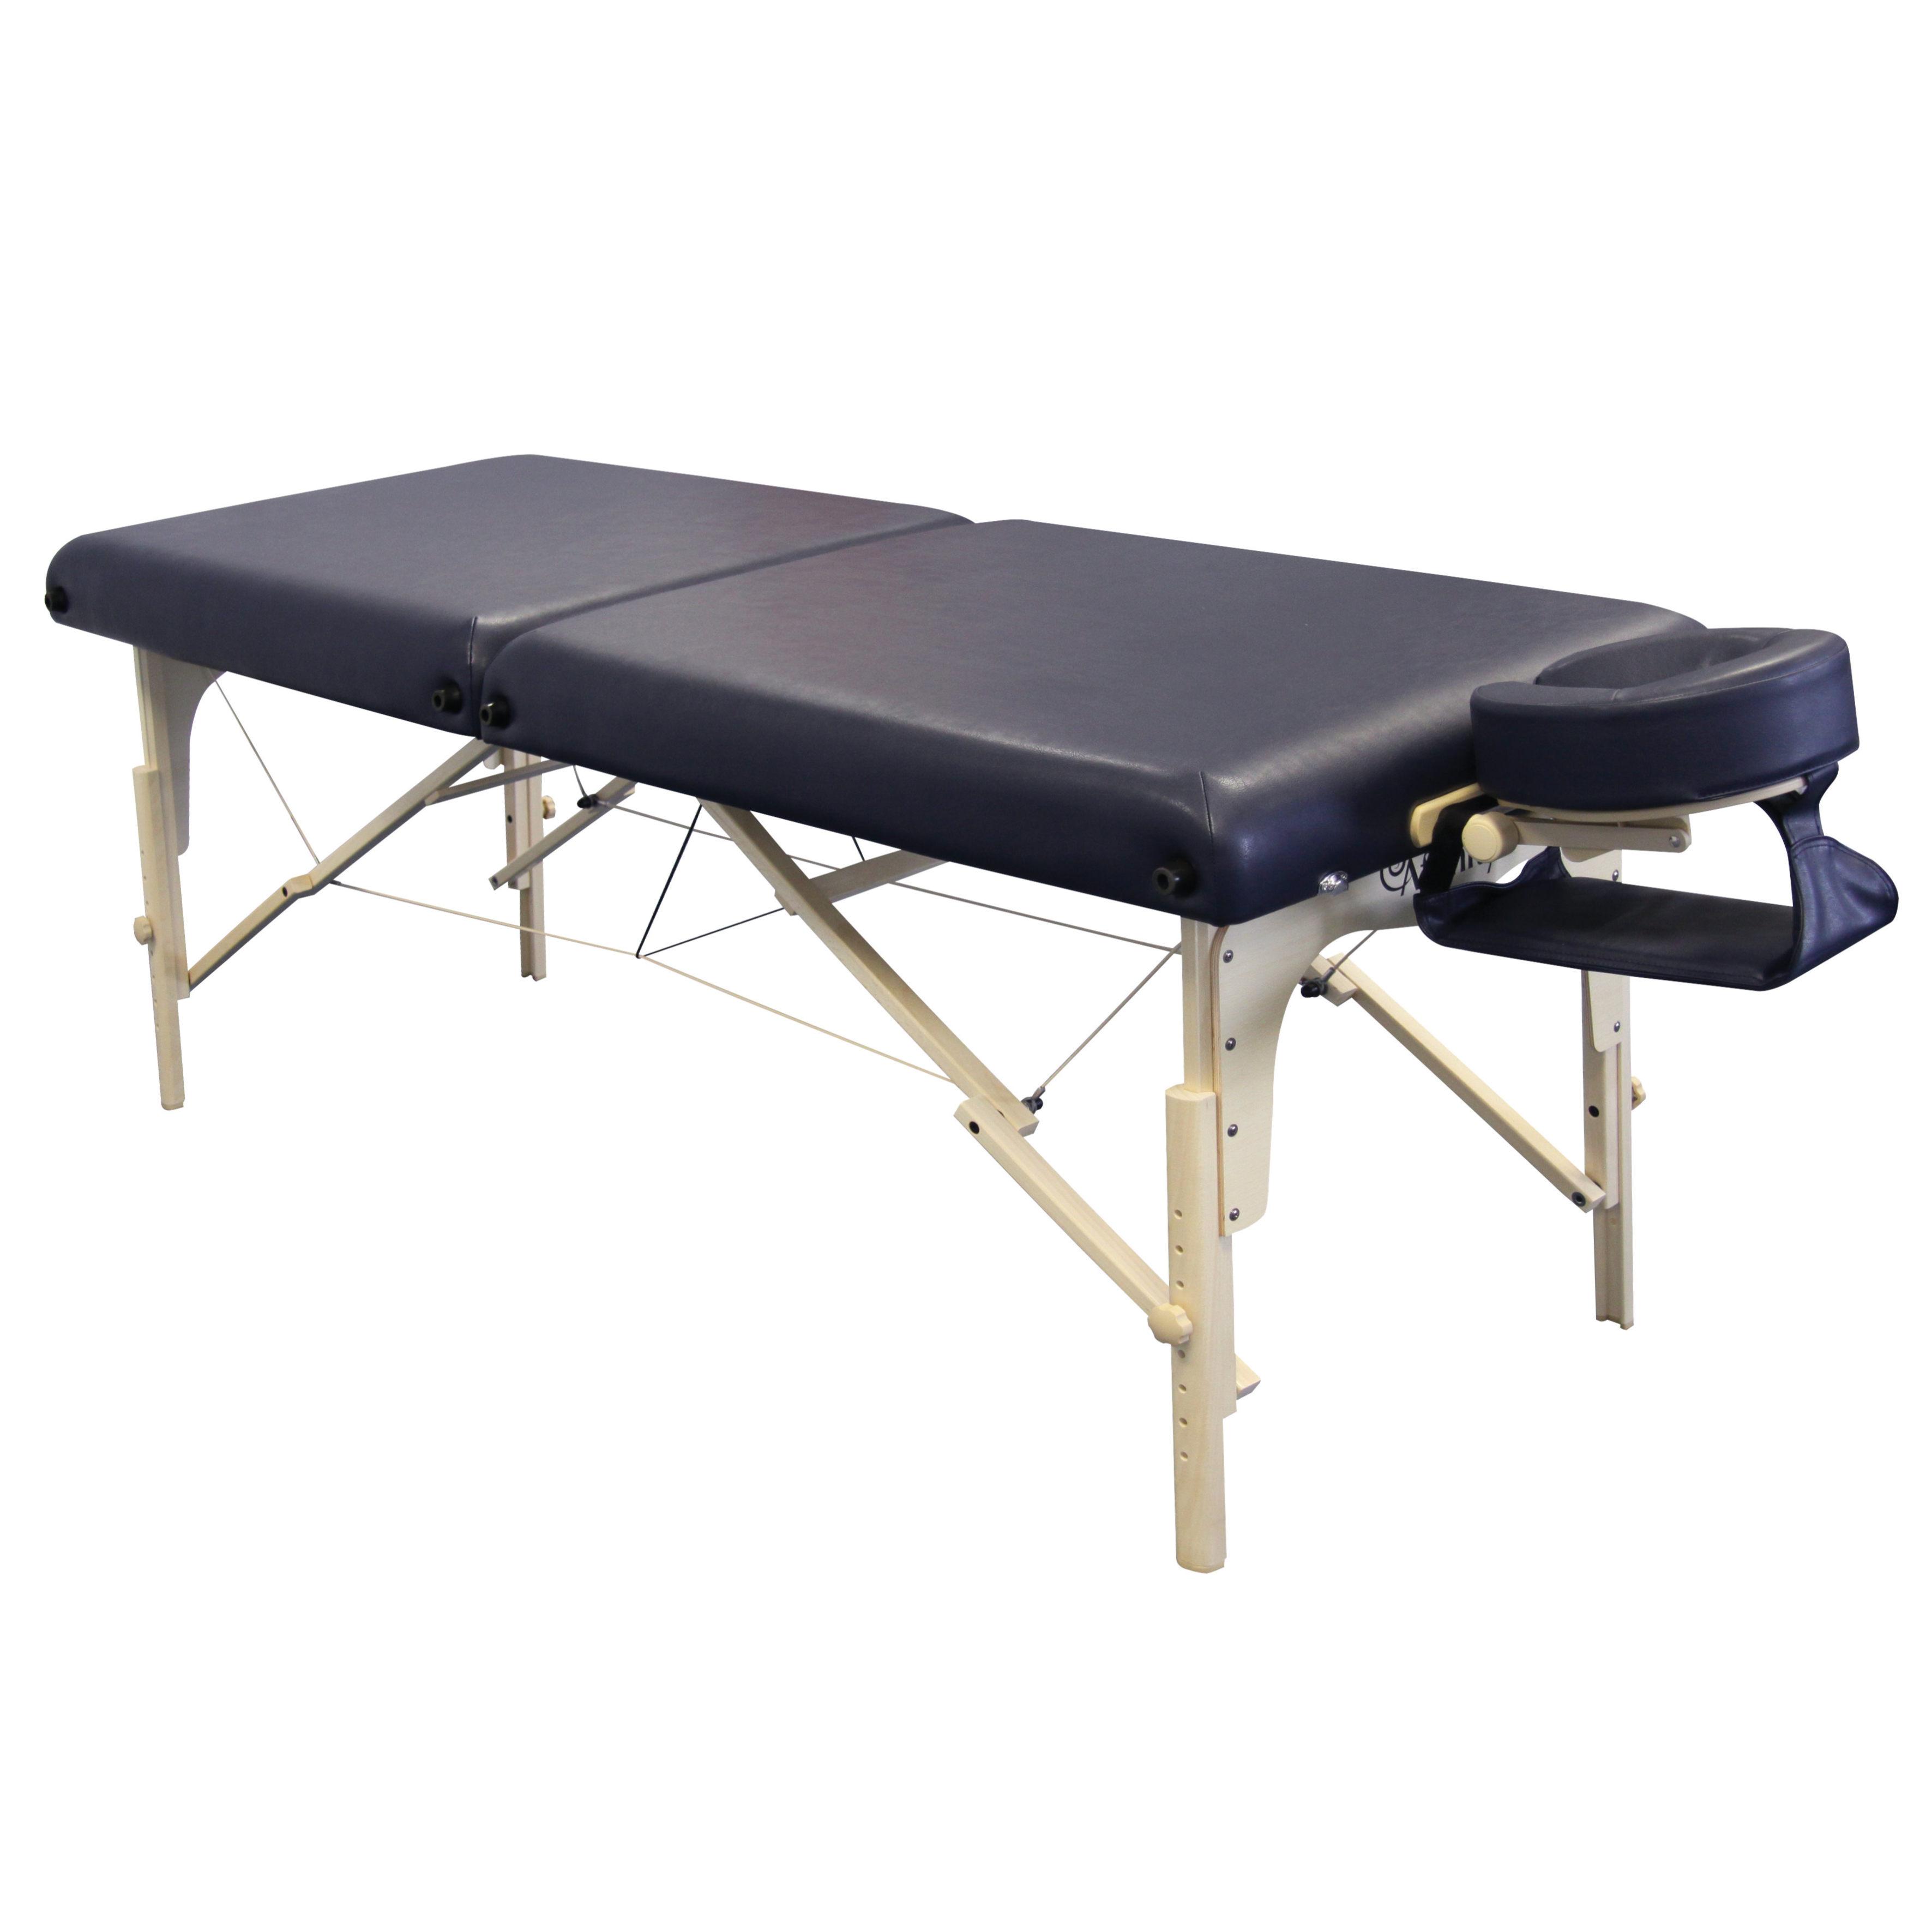 Affinity sienna portable massage table body massage shop - Massage table professional ...